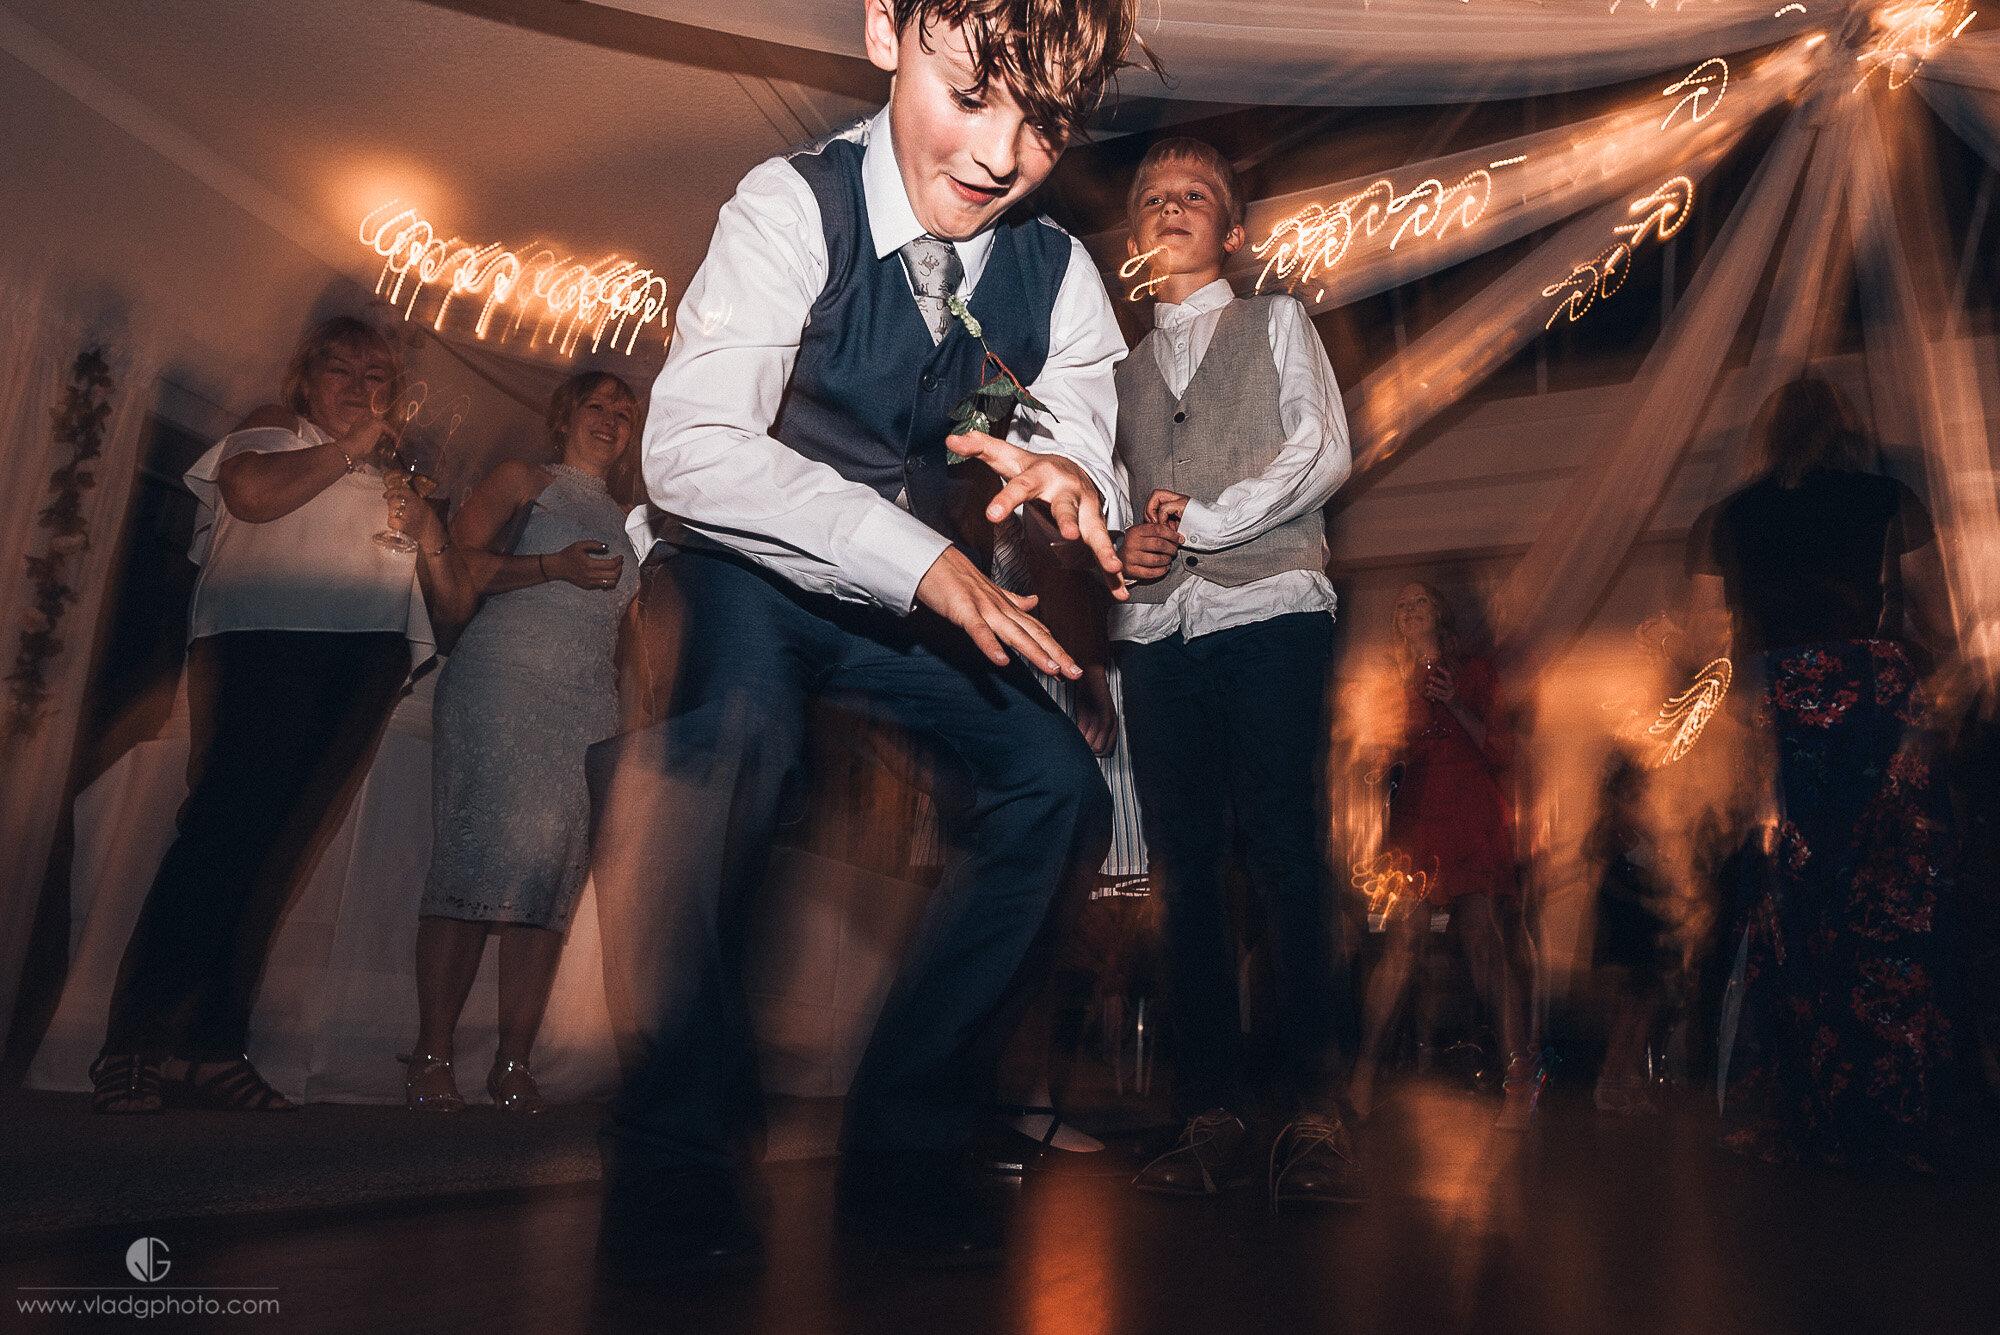 Wedding Photographer Gisburn Lancashire_7.jpg